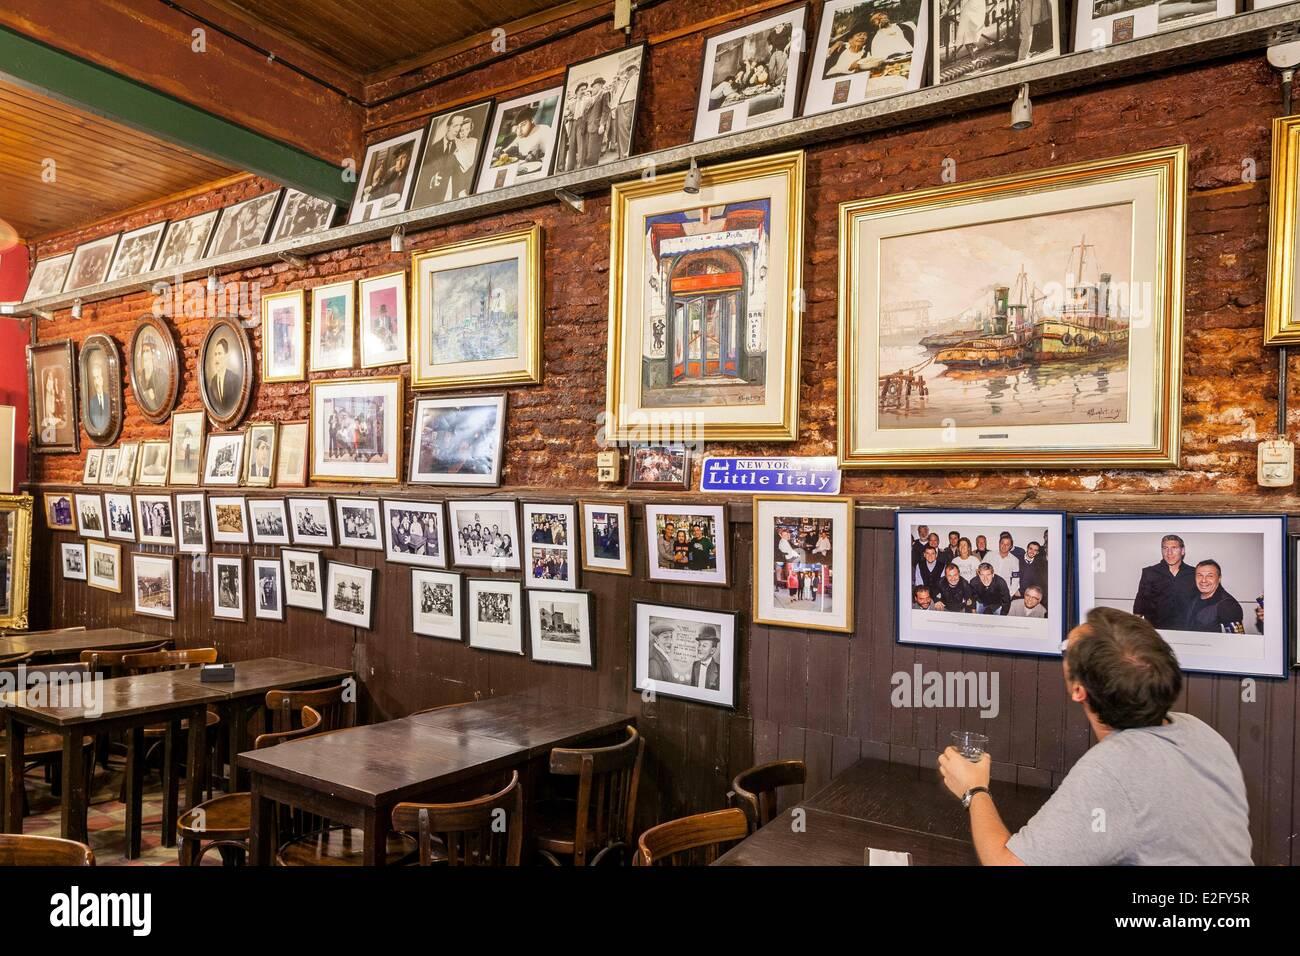 Argentina Buenos Aires La Boca District La Perla Cafe Opened In 1885